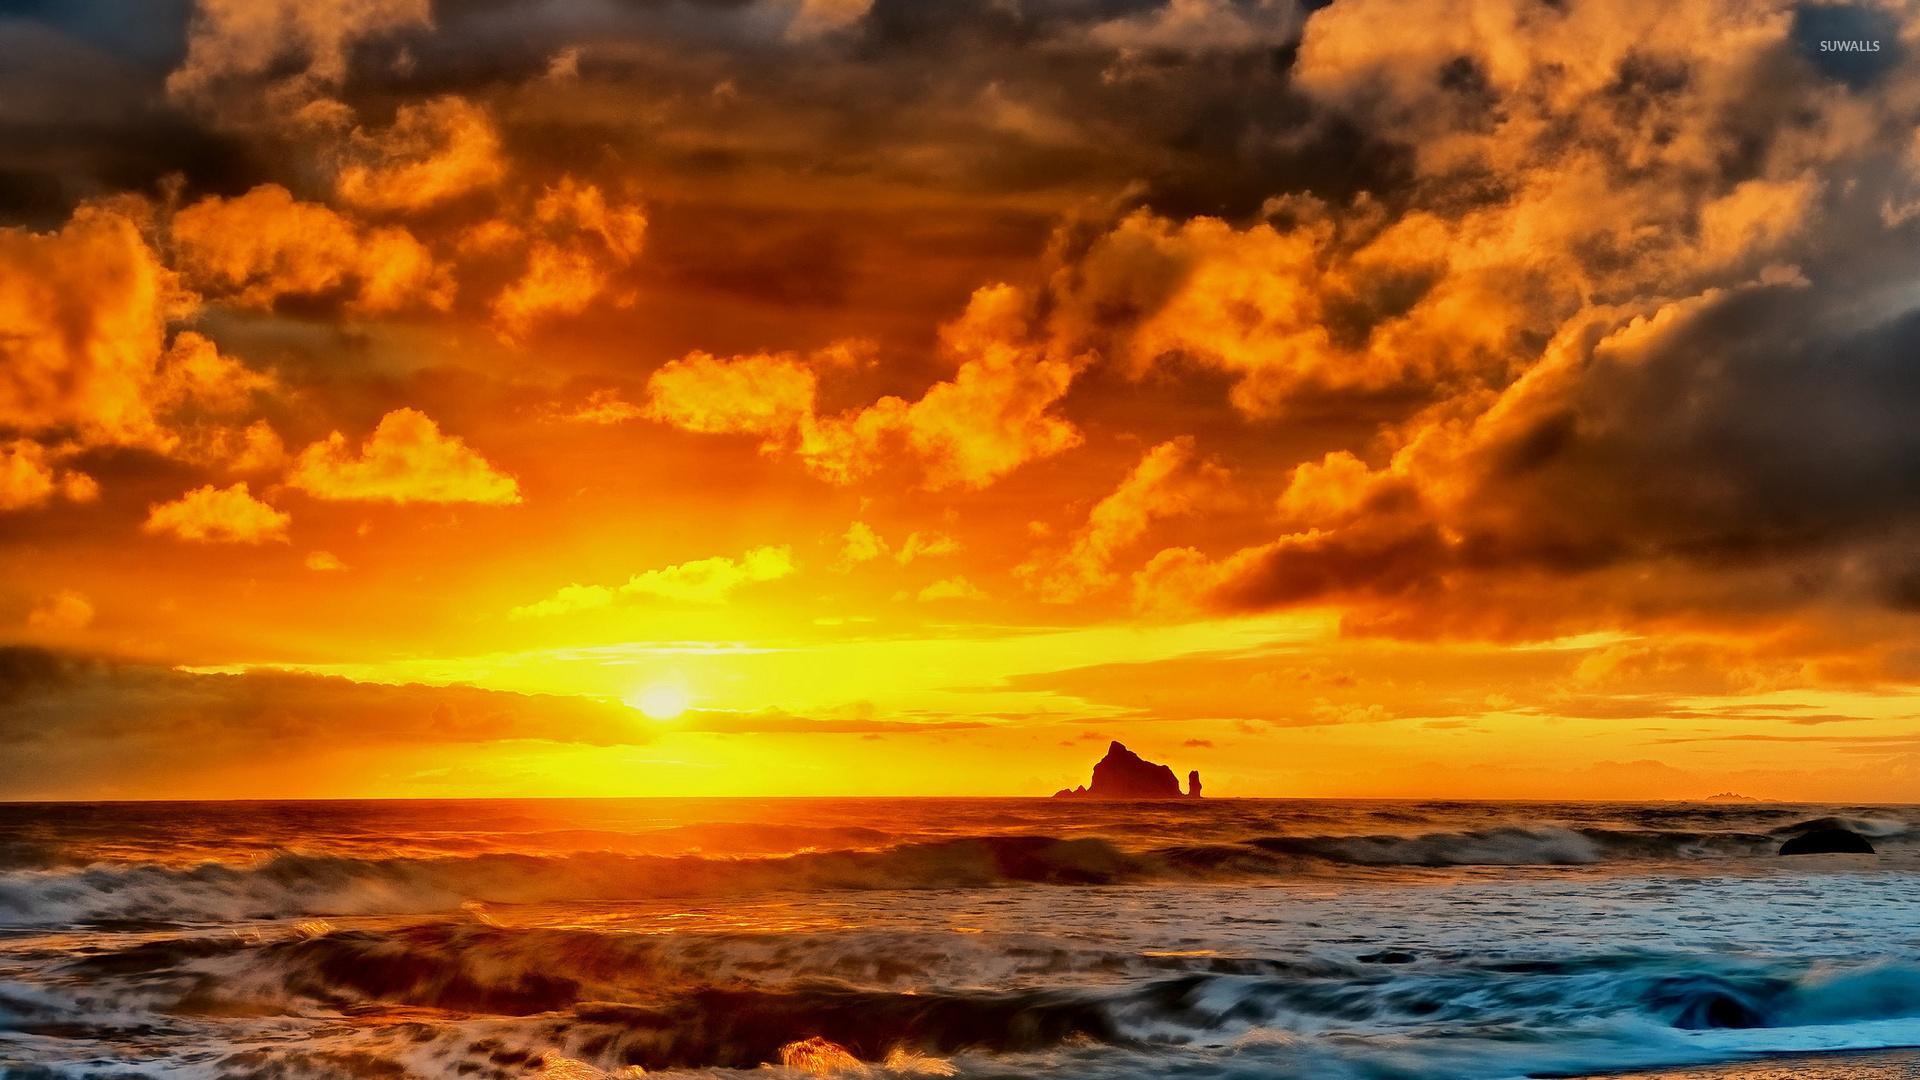 beautiful clouds at sunset wallpaper - beach wallpapers - #45067